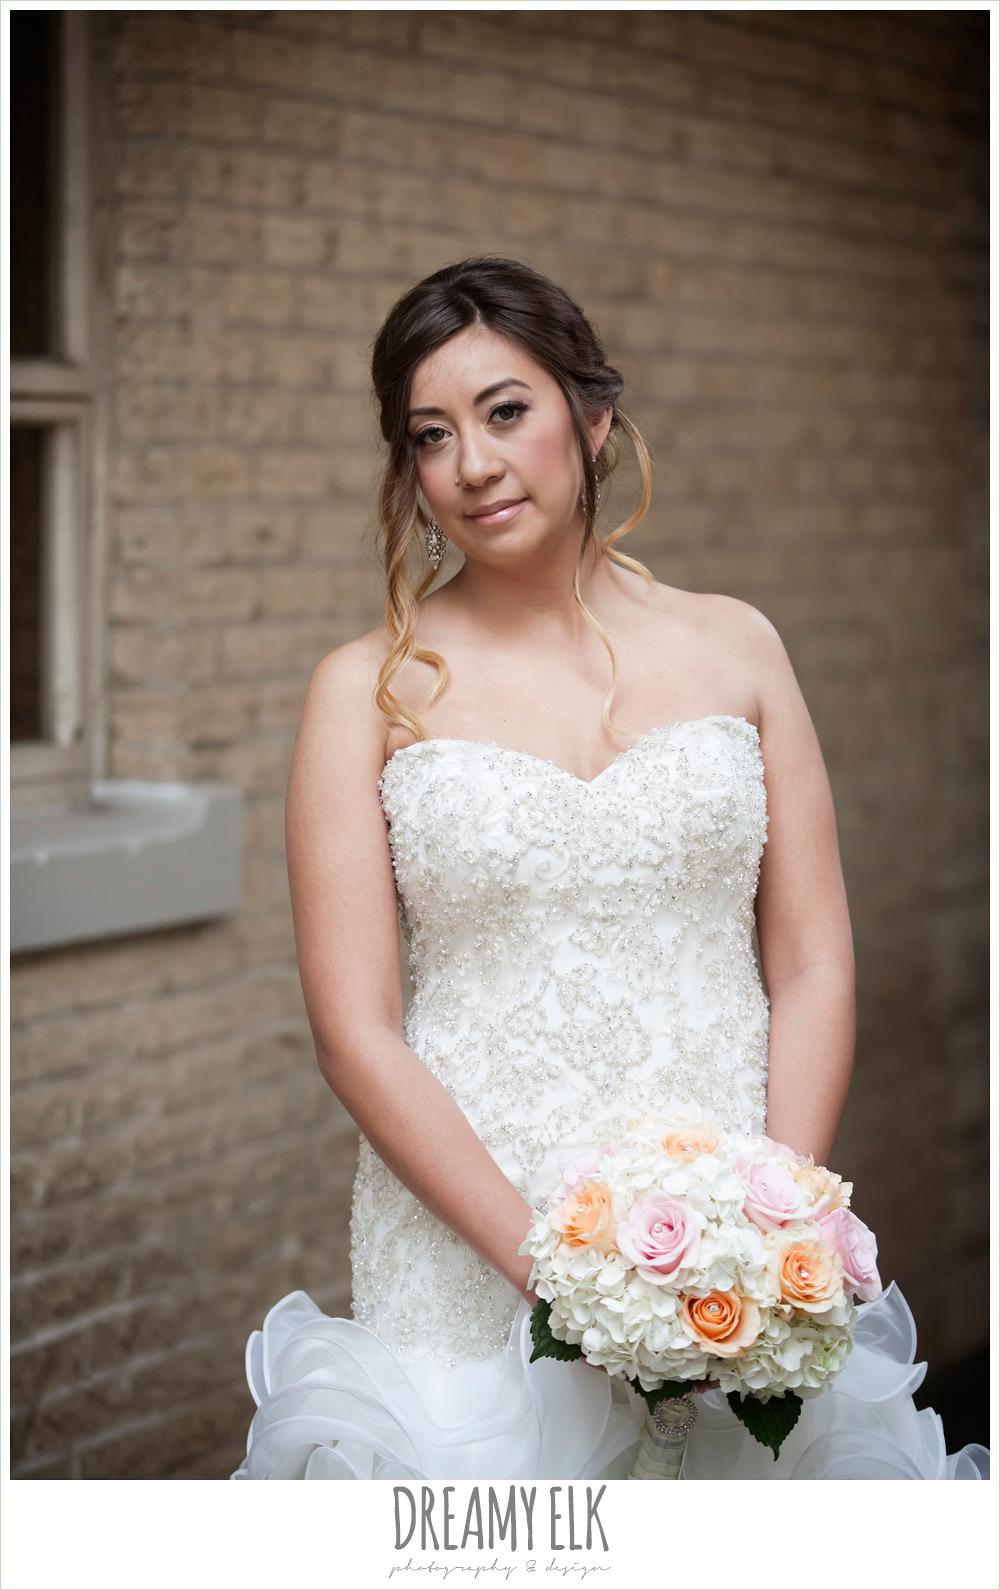 sweetheart strapless wedding dress, downtown austin wedding {dreamy elk photography and design}